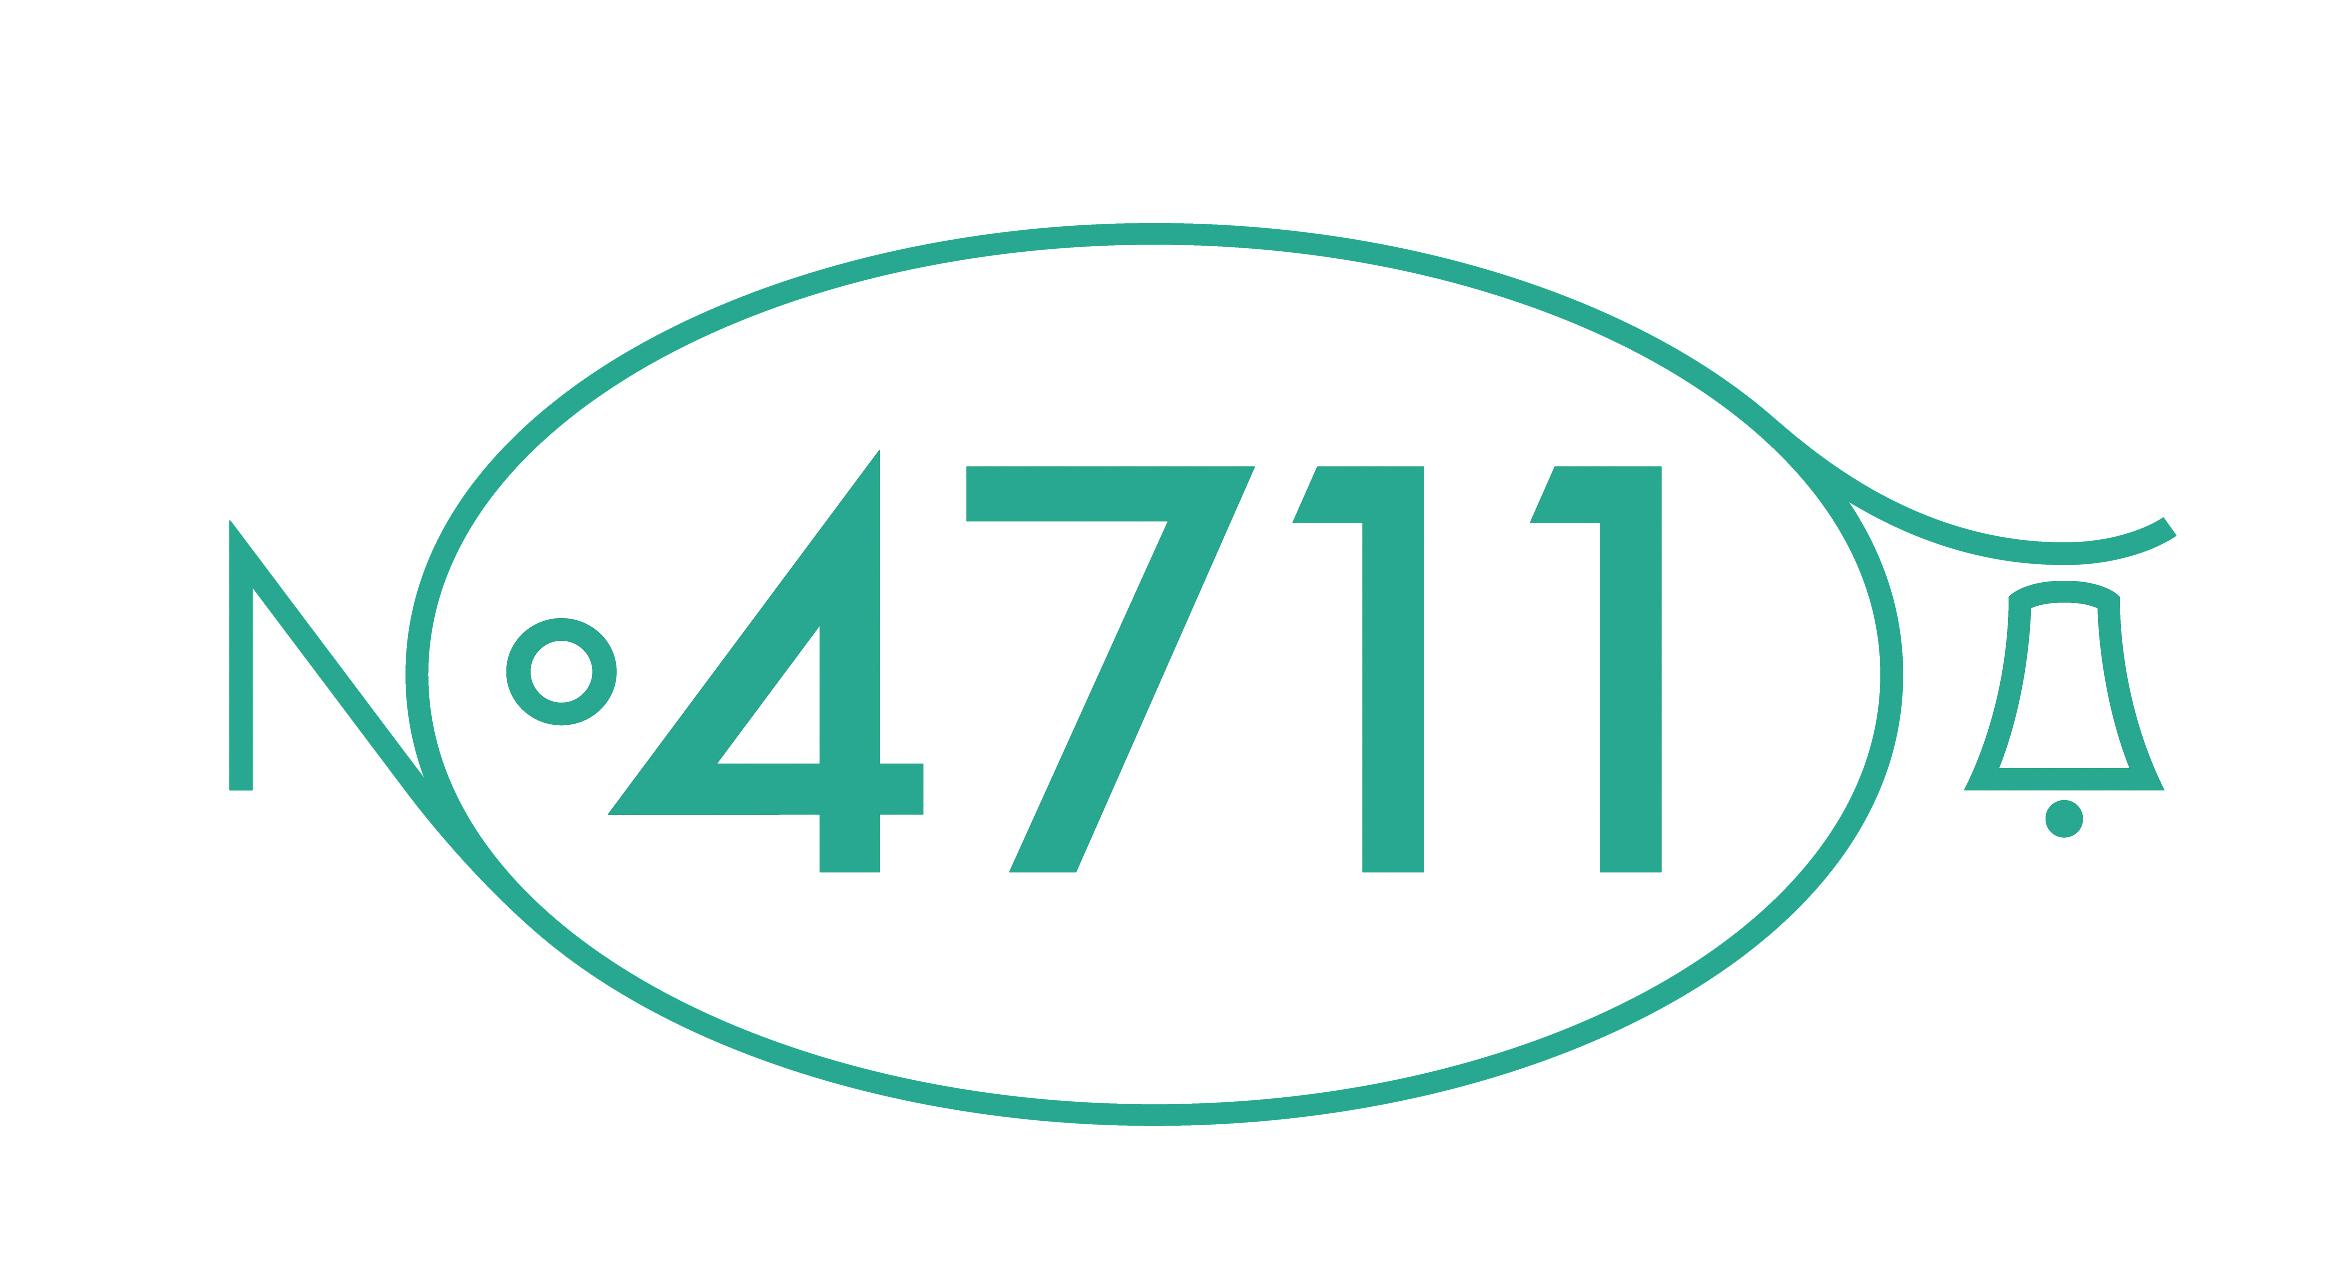 N°4711